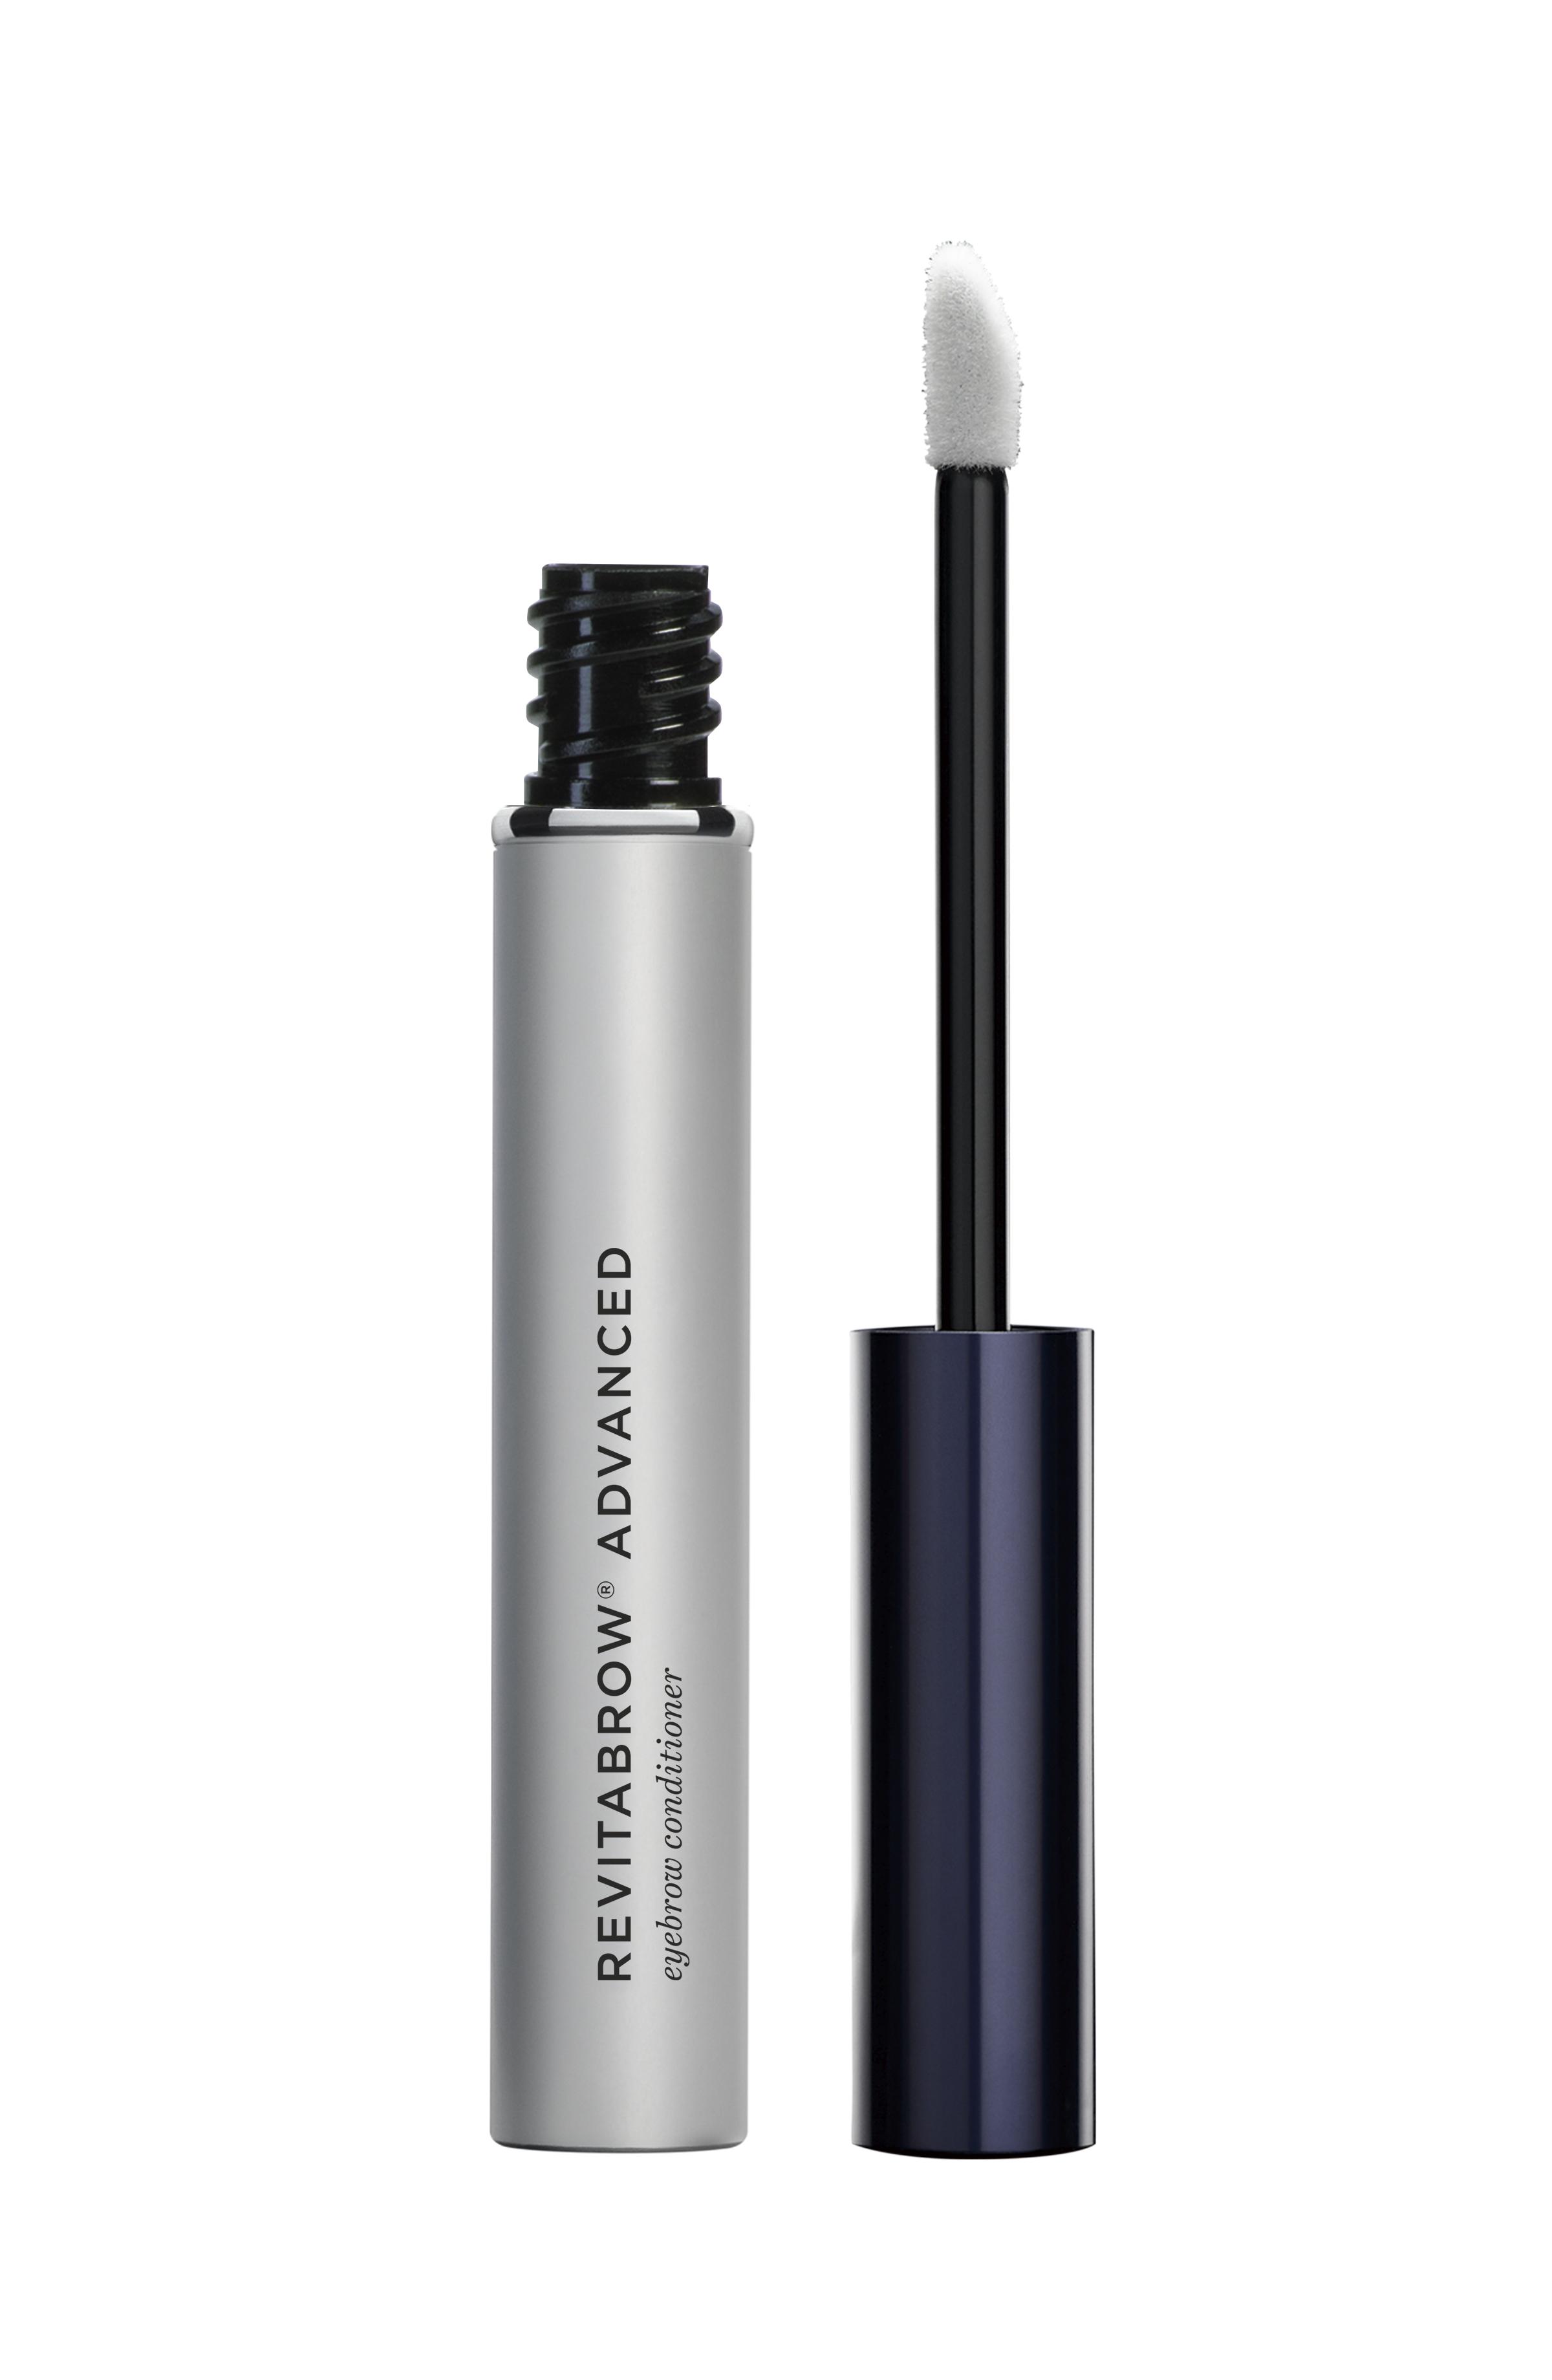 Revitalash Eyebrow Conditioner, 3 ml